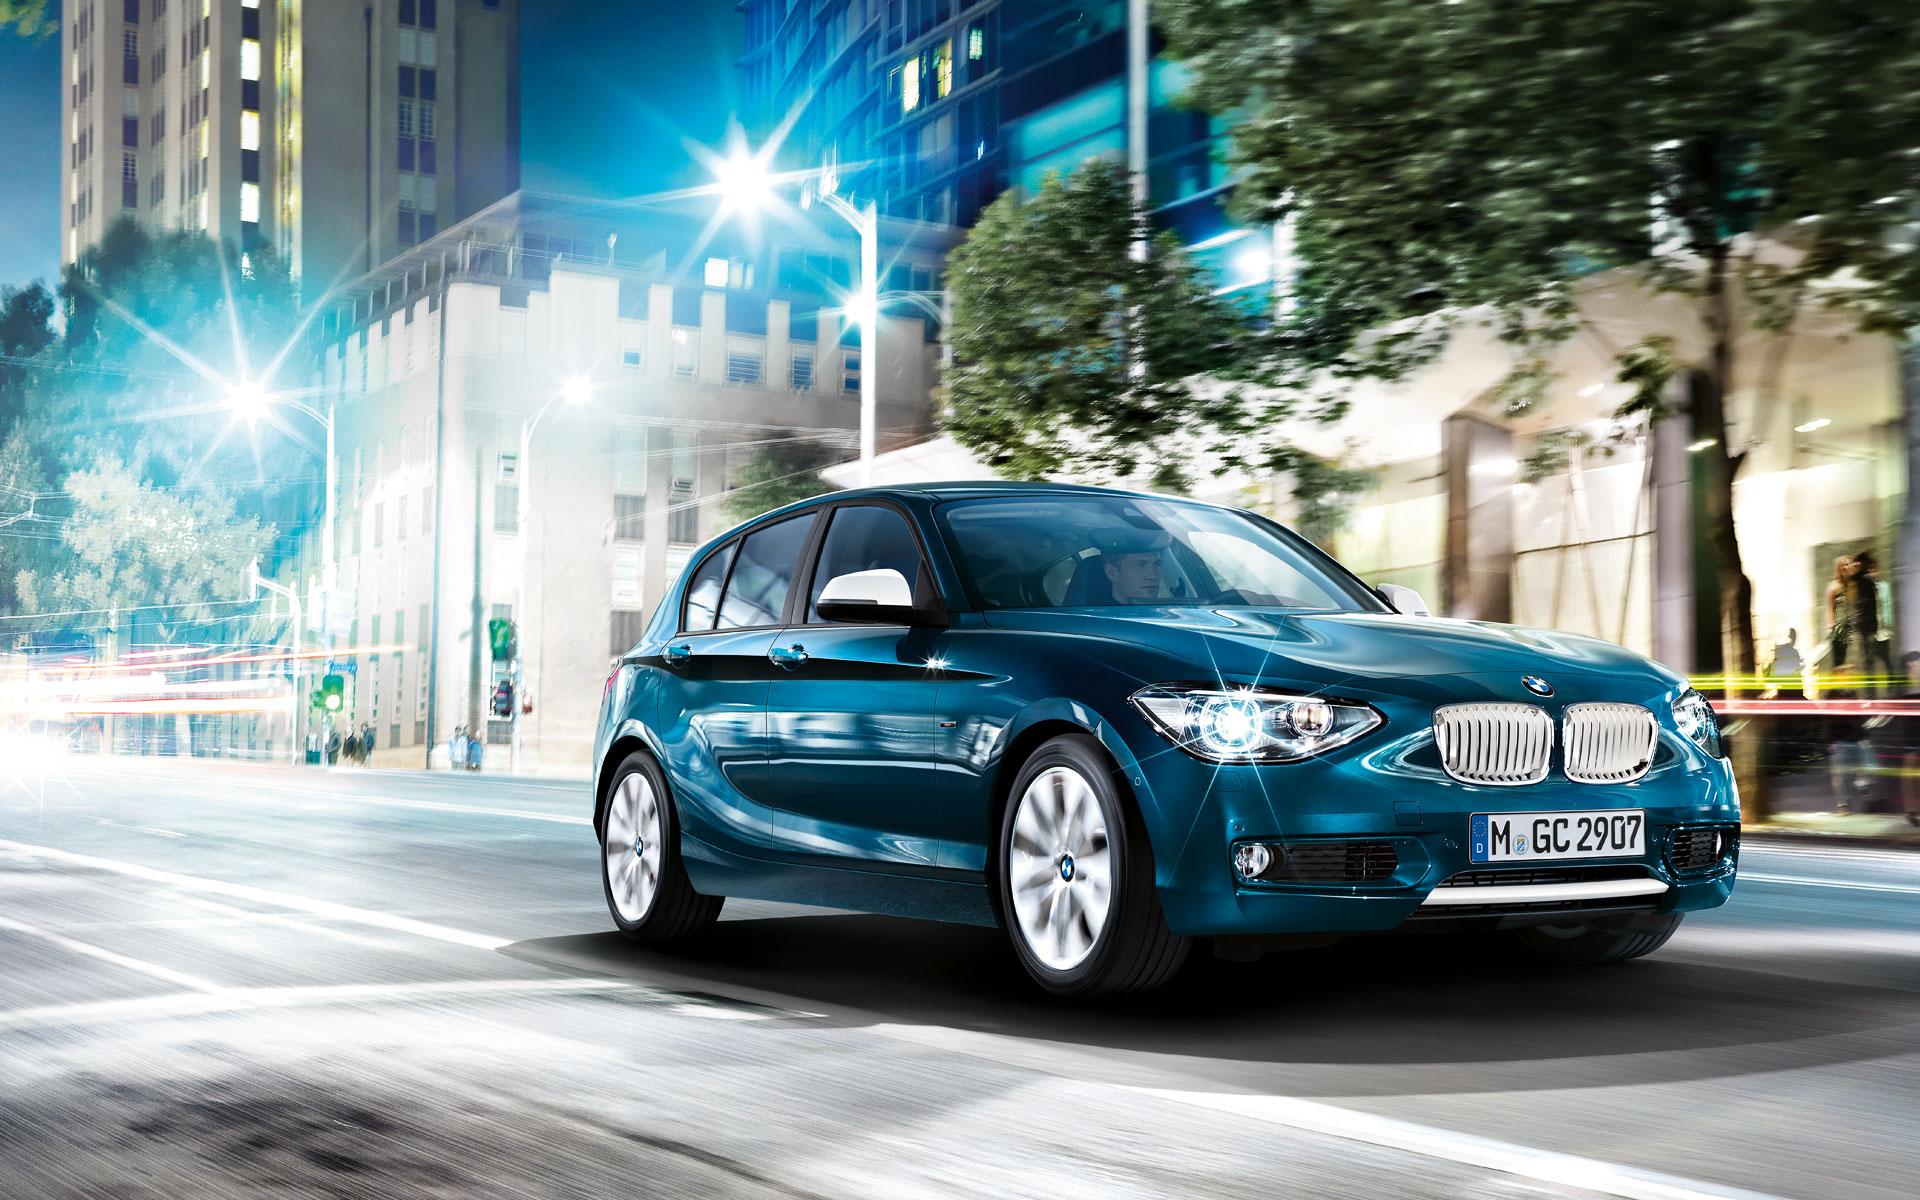 BMW_1series_wallpaper_04_1920_1200.jpg.resource.1373895741387.jpg